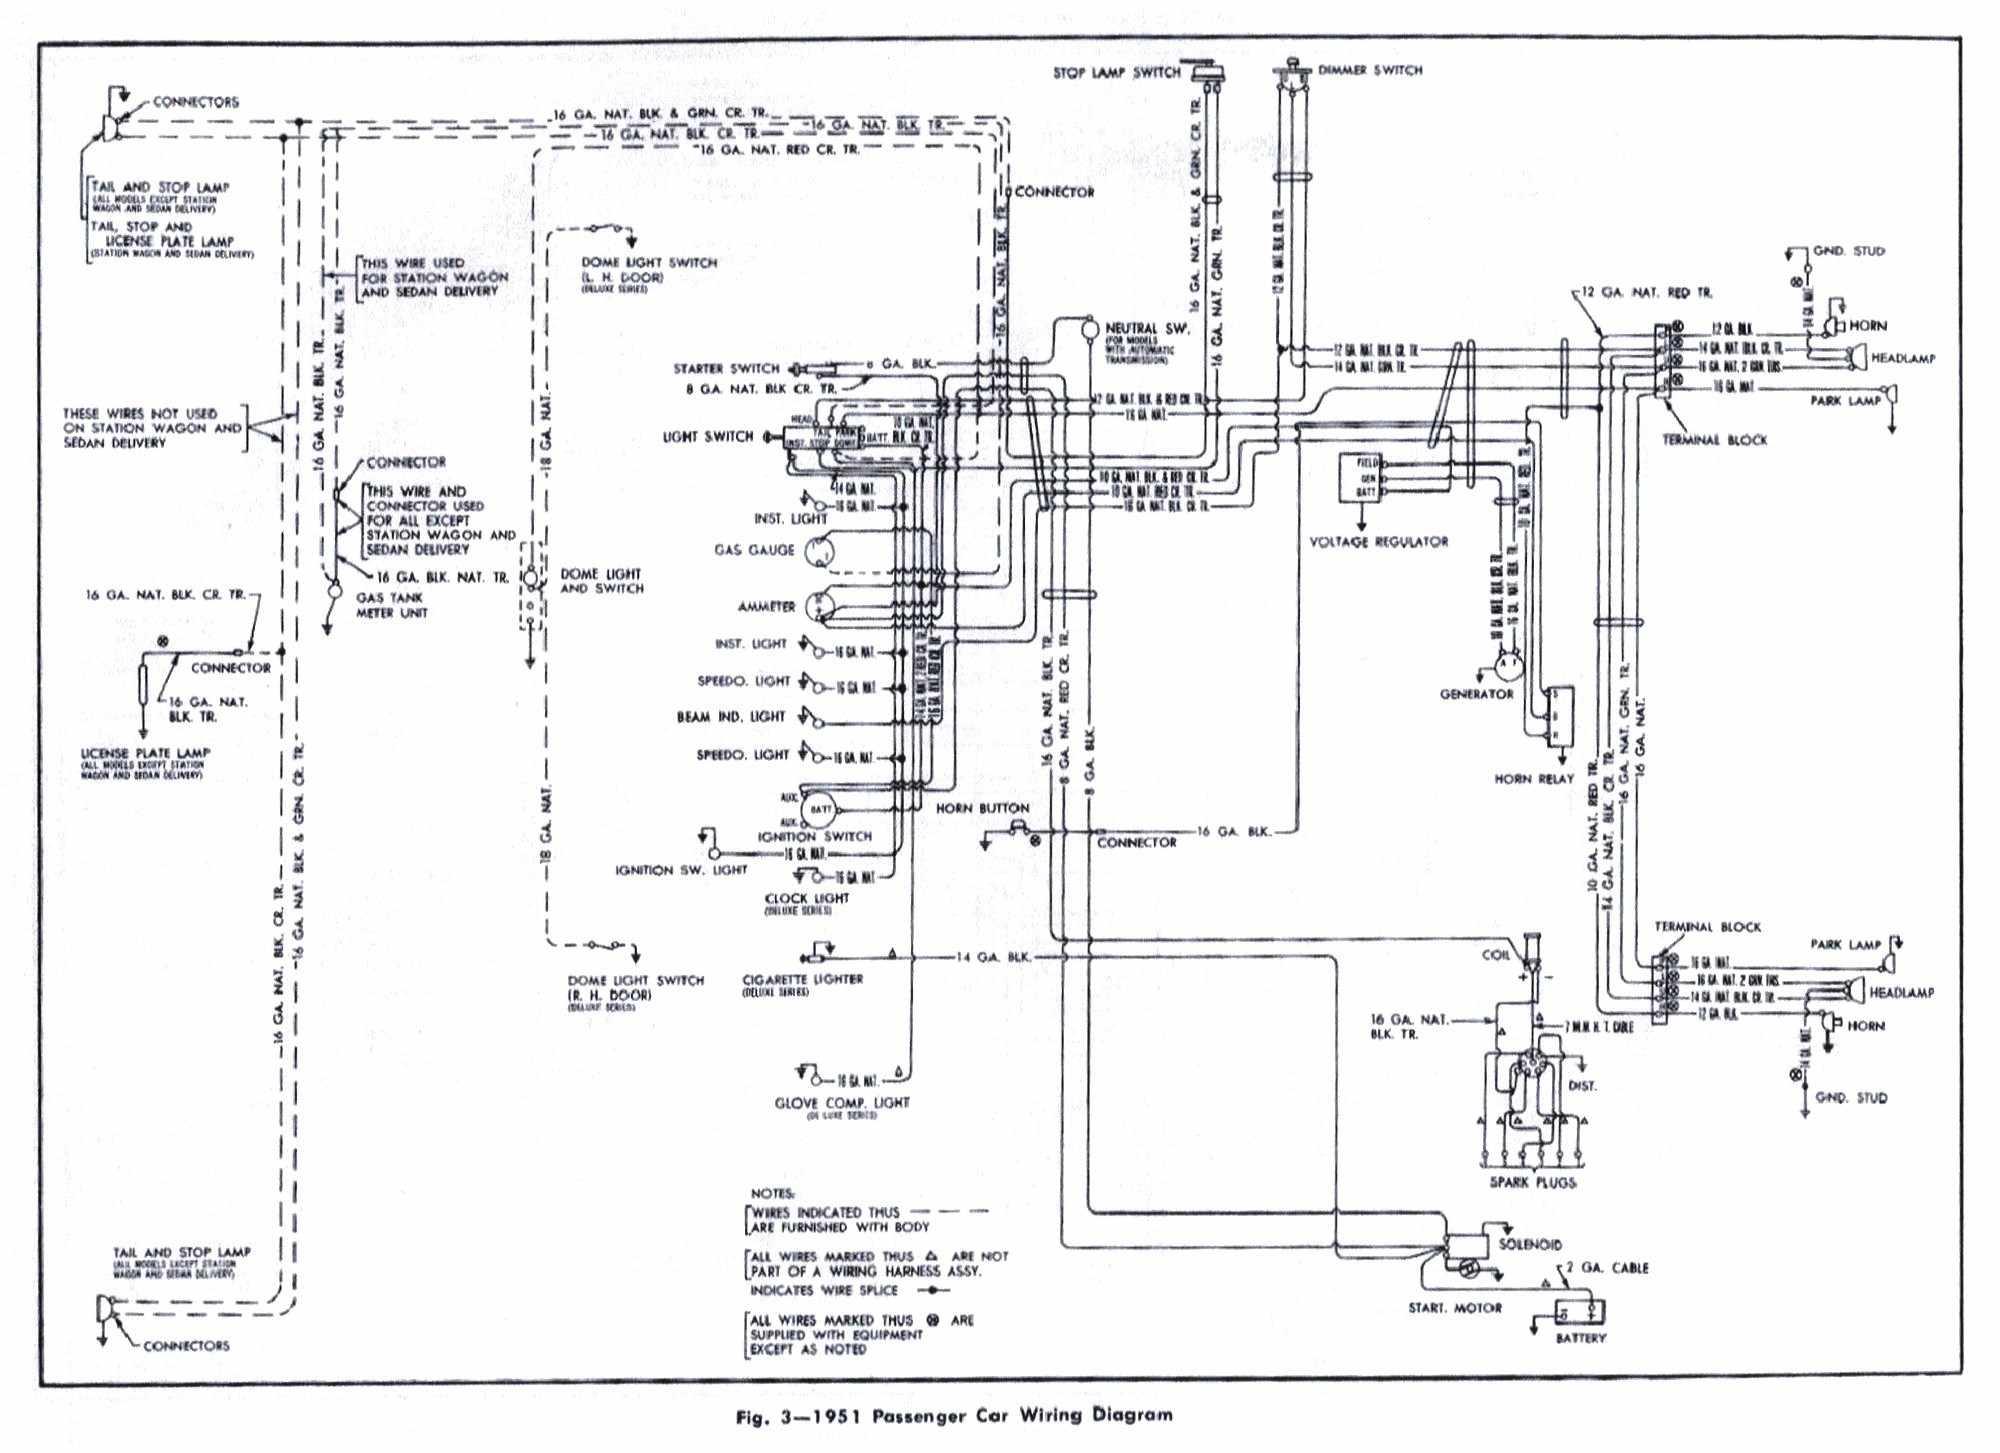 1966 impala chevrolet passenger car wiring diagram manual